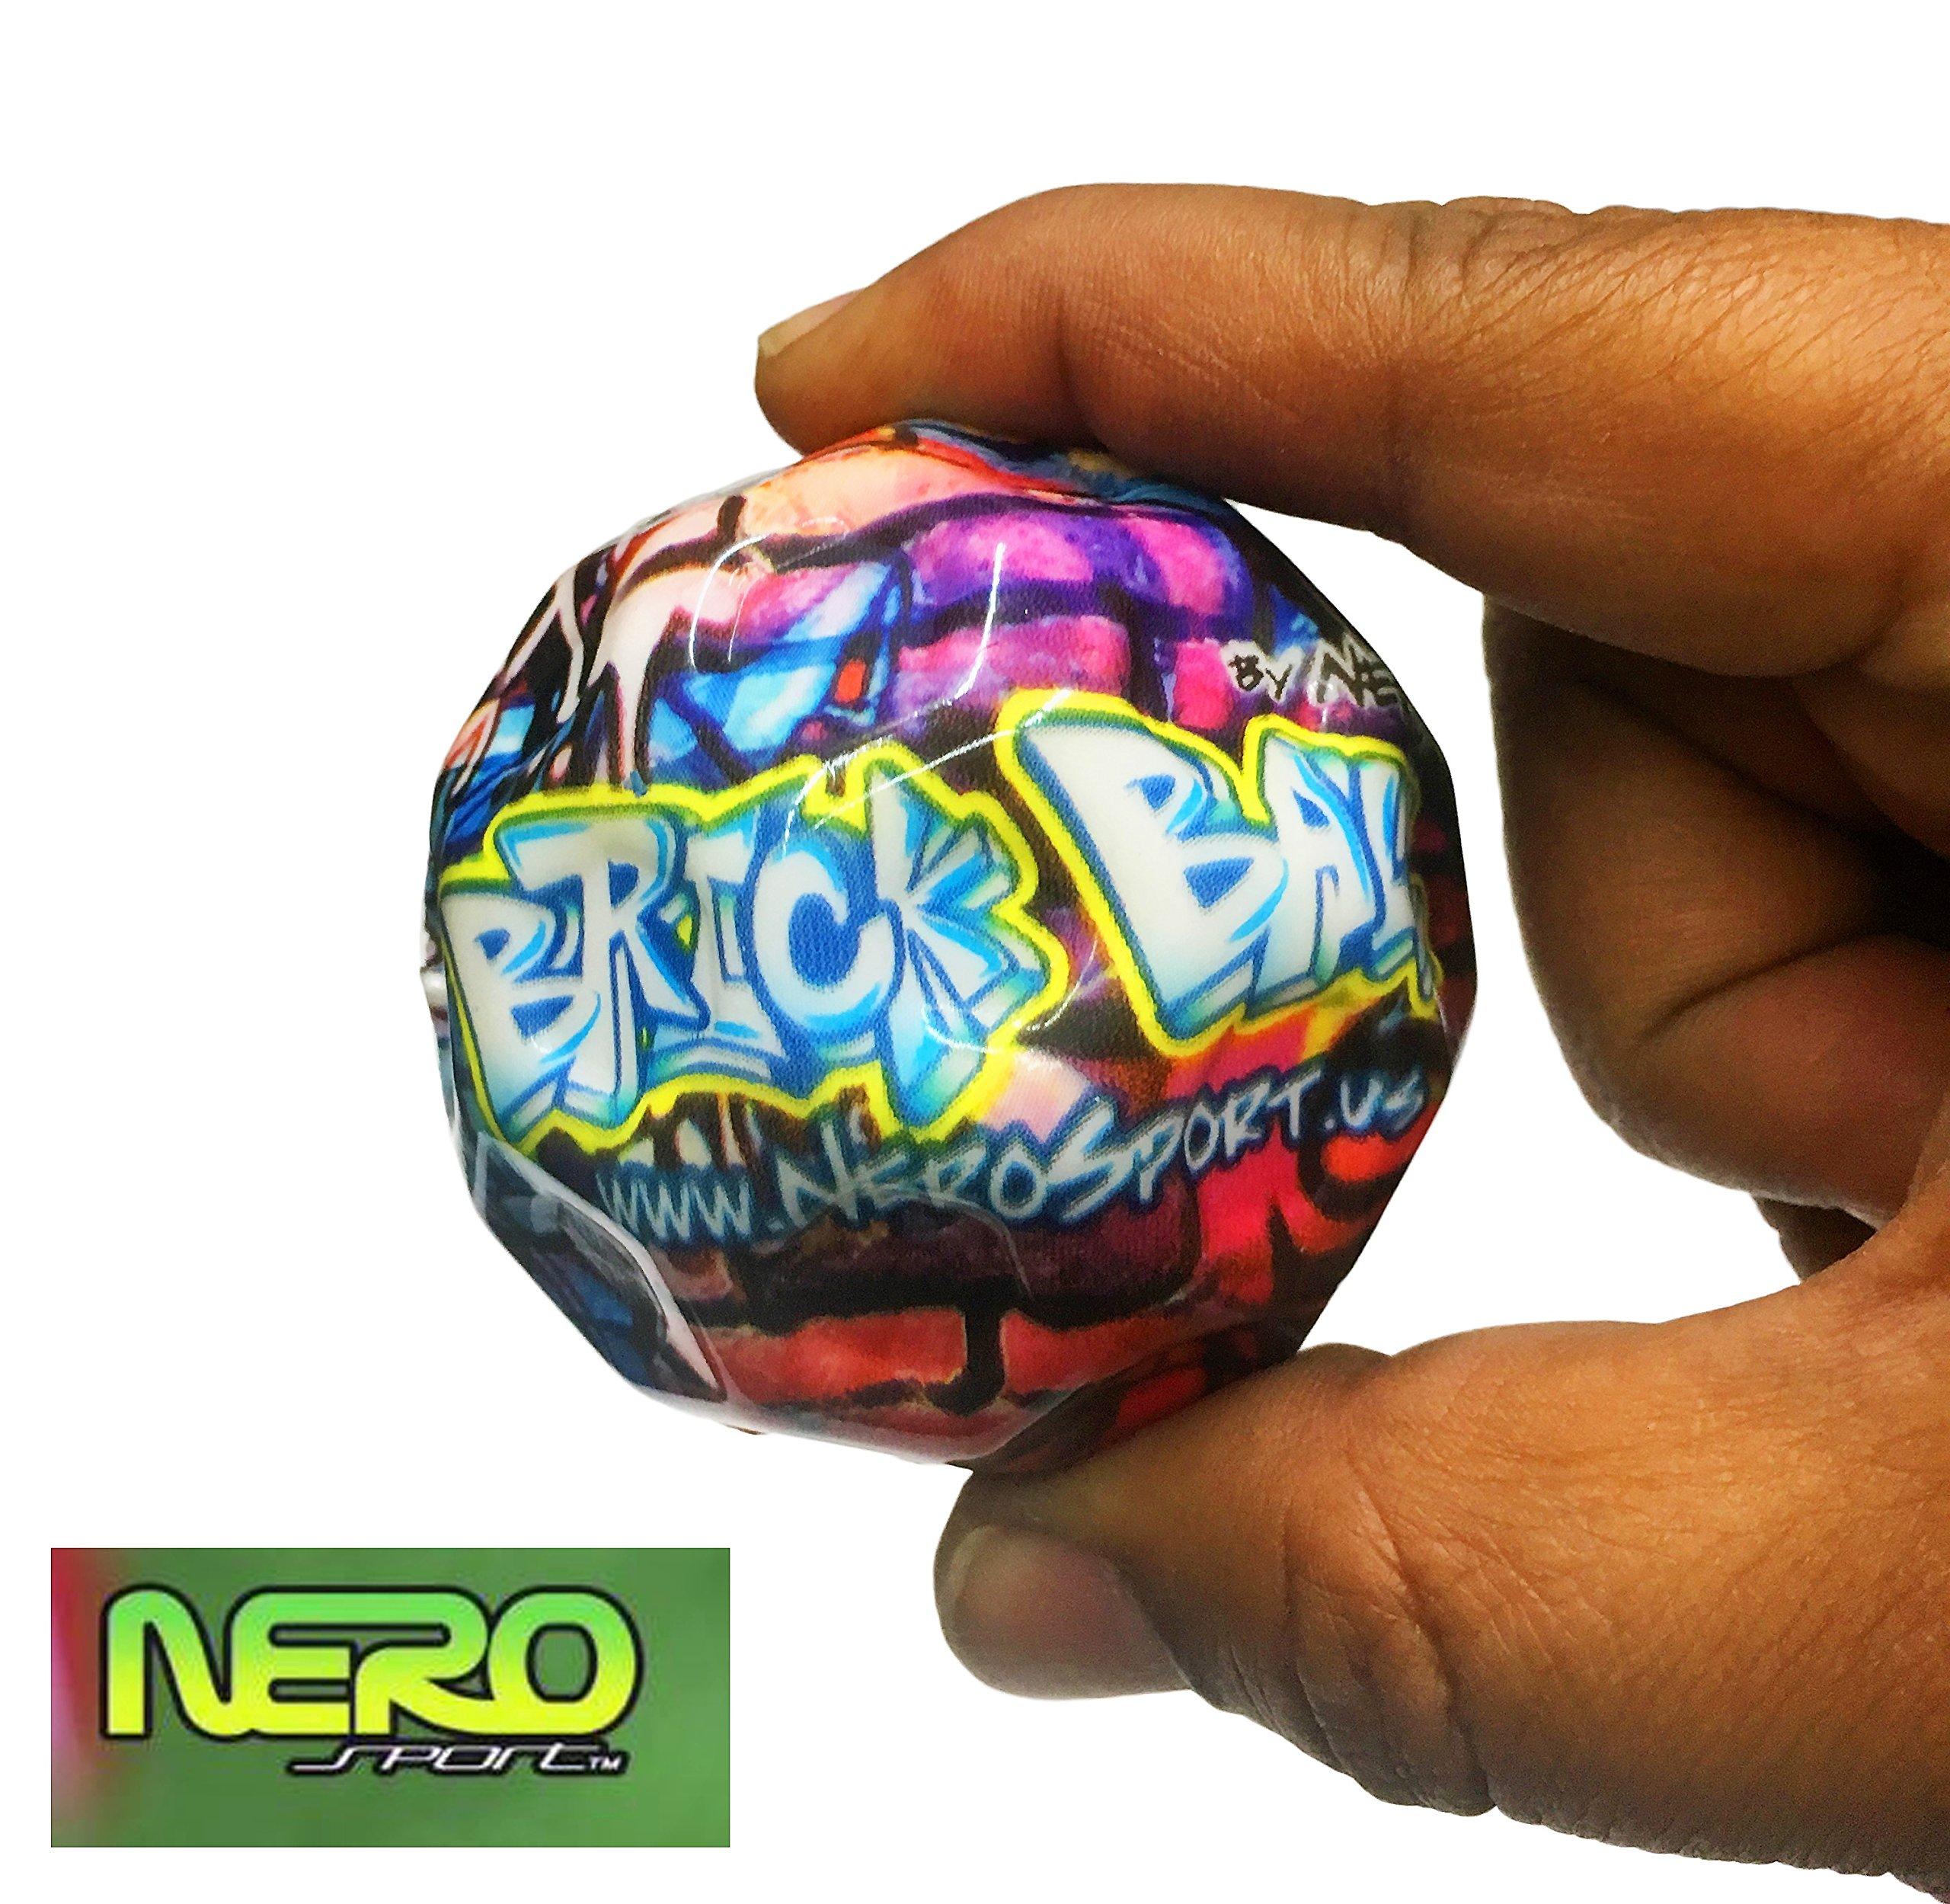 Nero SPORT Brick Ball High Bounce & Agility Ball Parkour Edition (single)